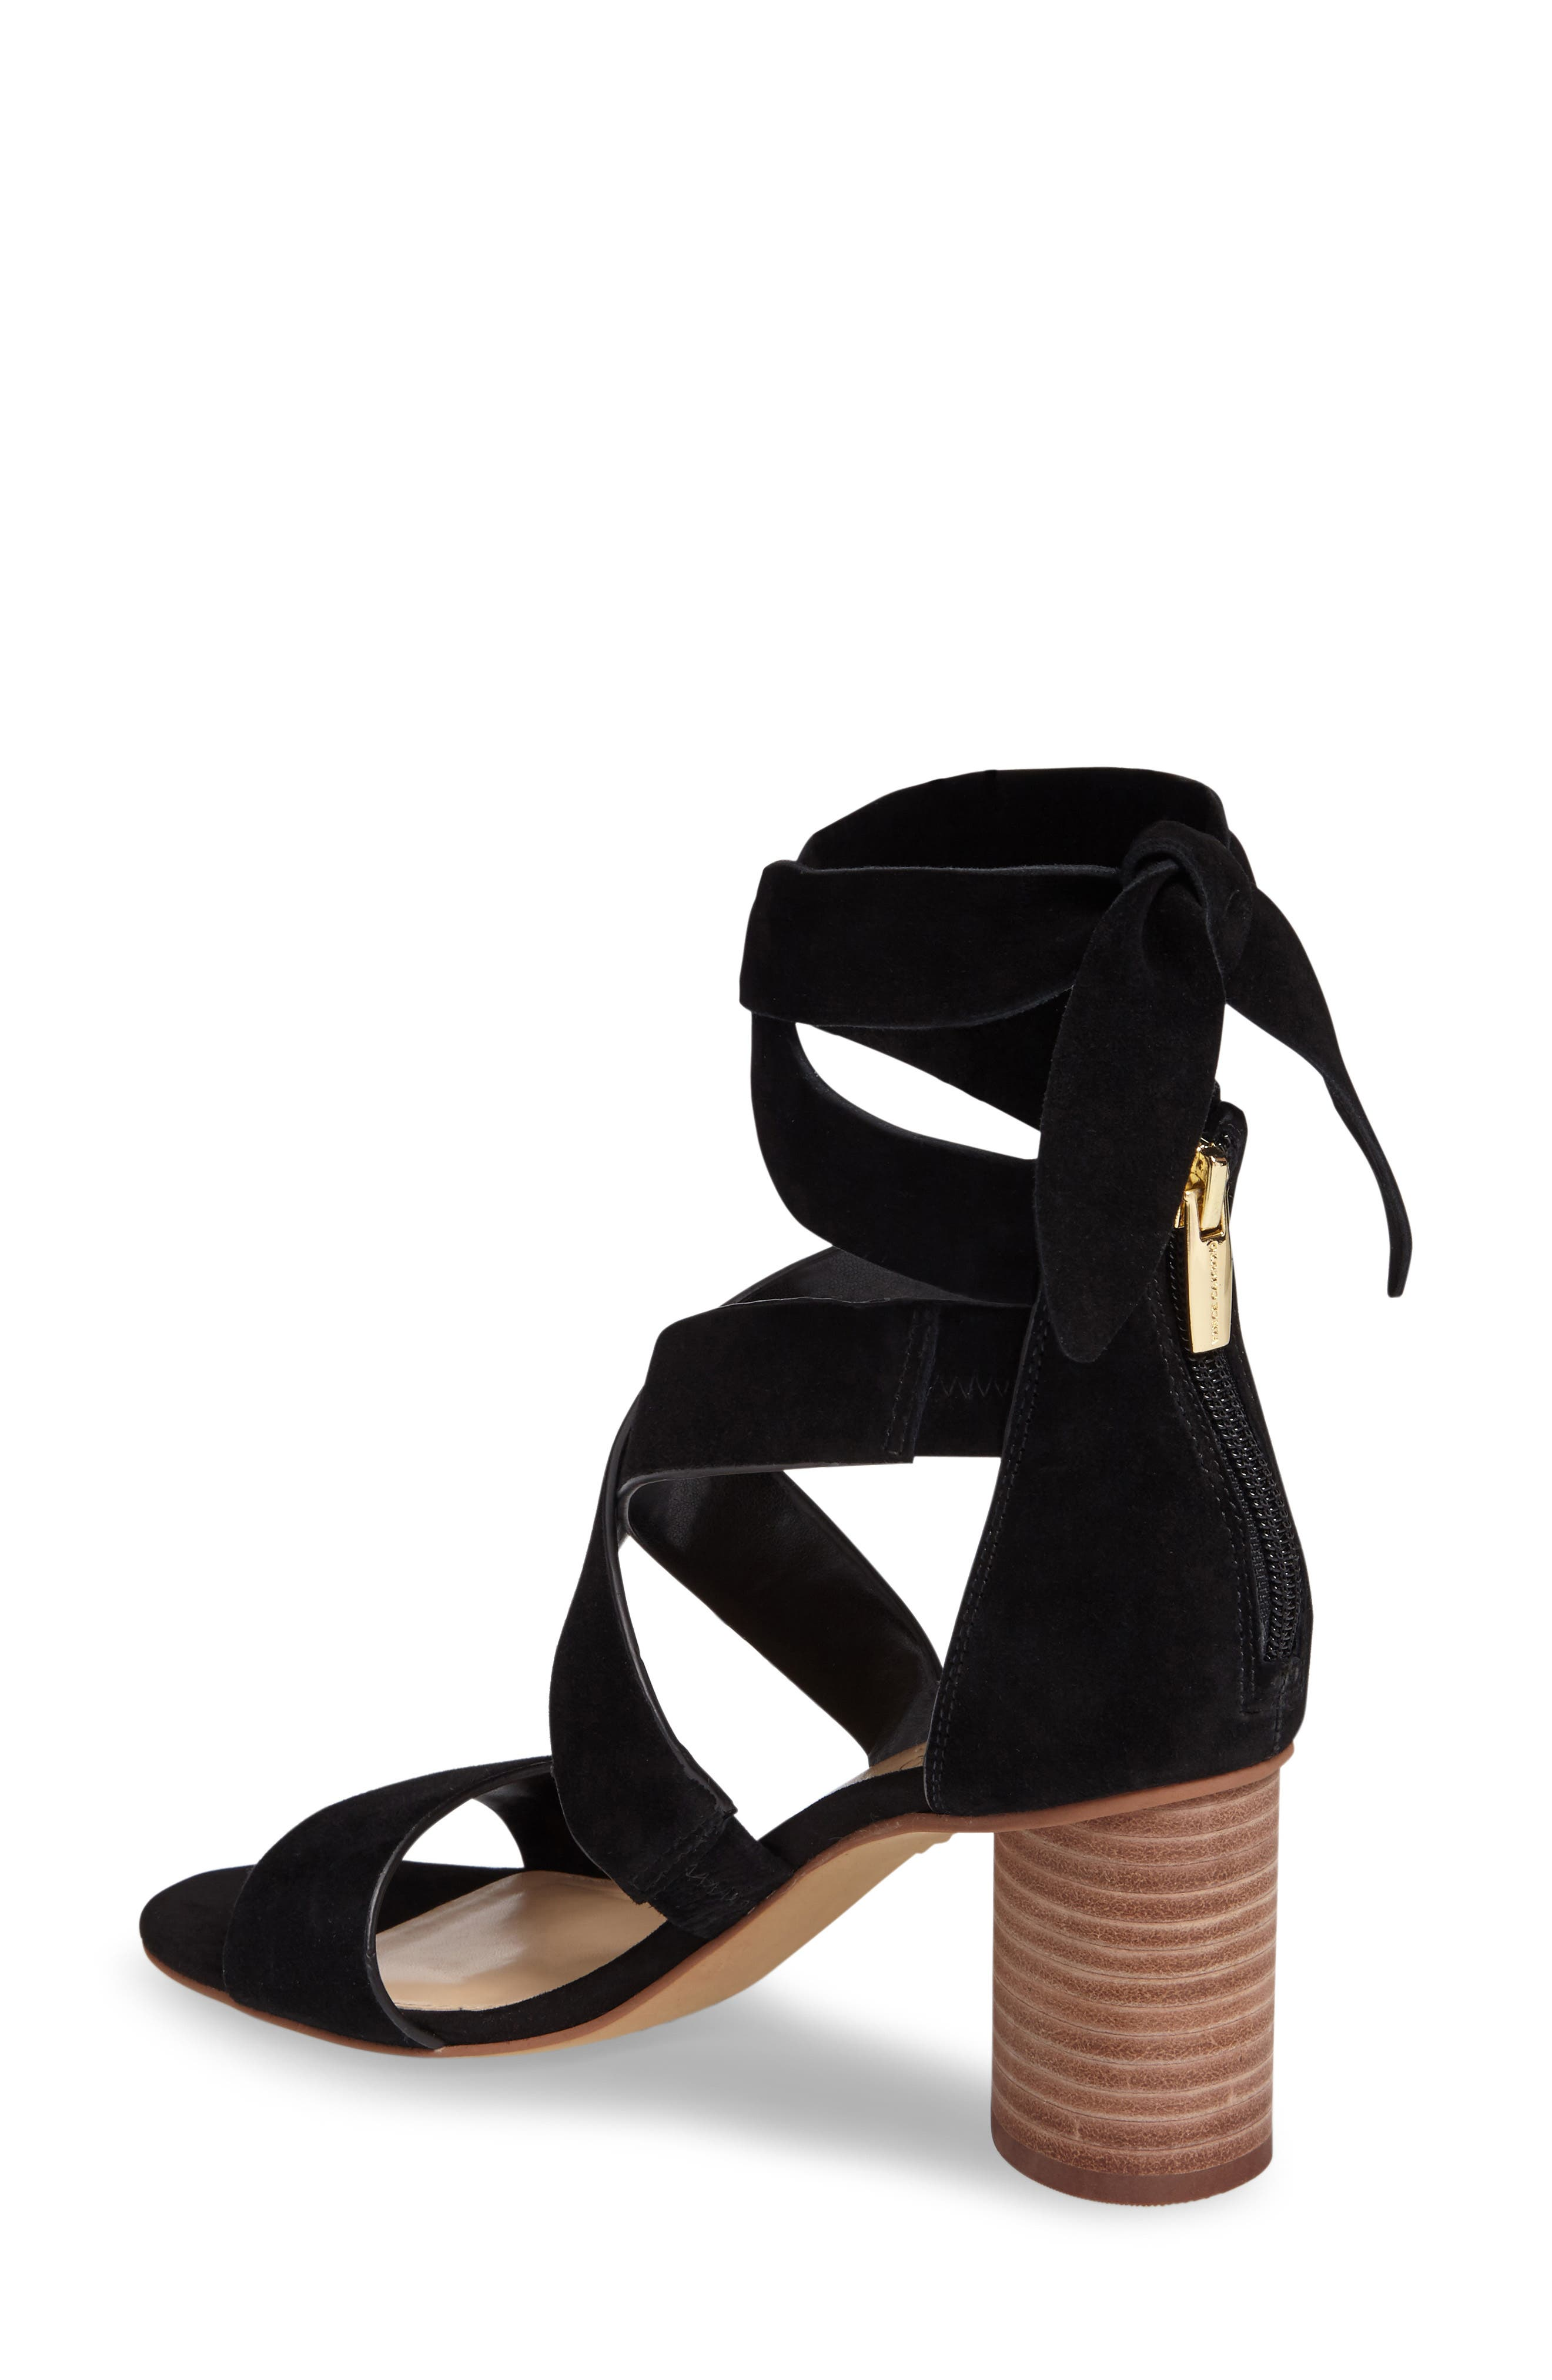 Jeneve Block Heel Sandal,                             Alternate thumbnail 2, color,                             Black Suede